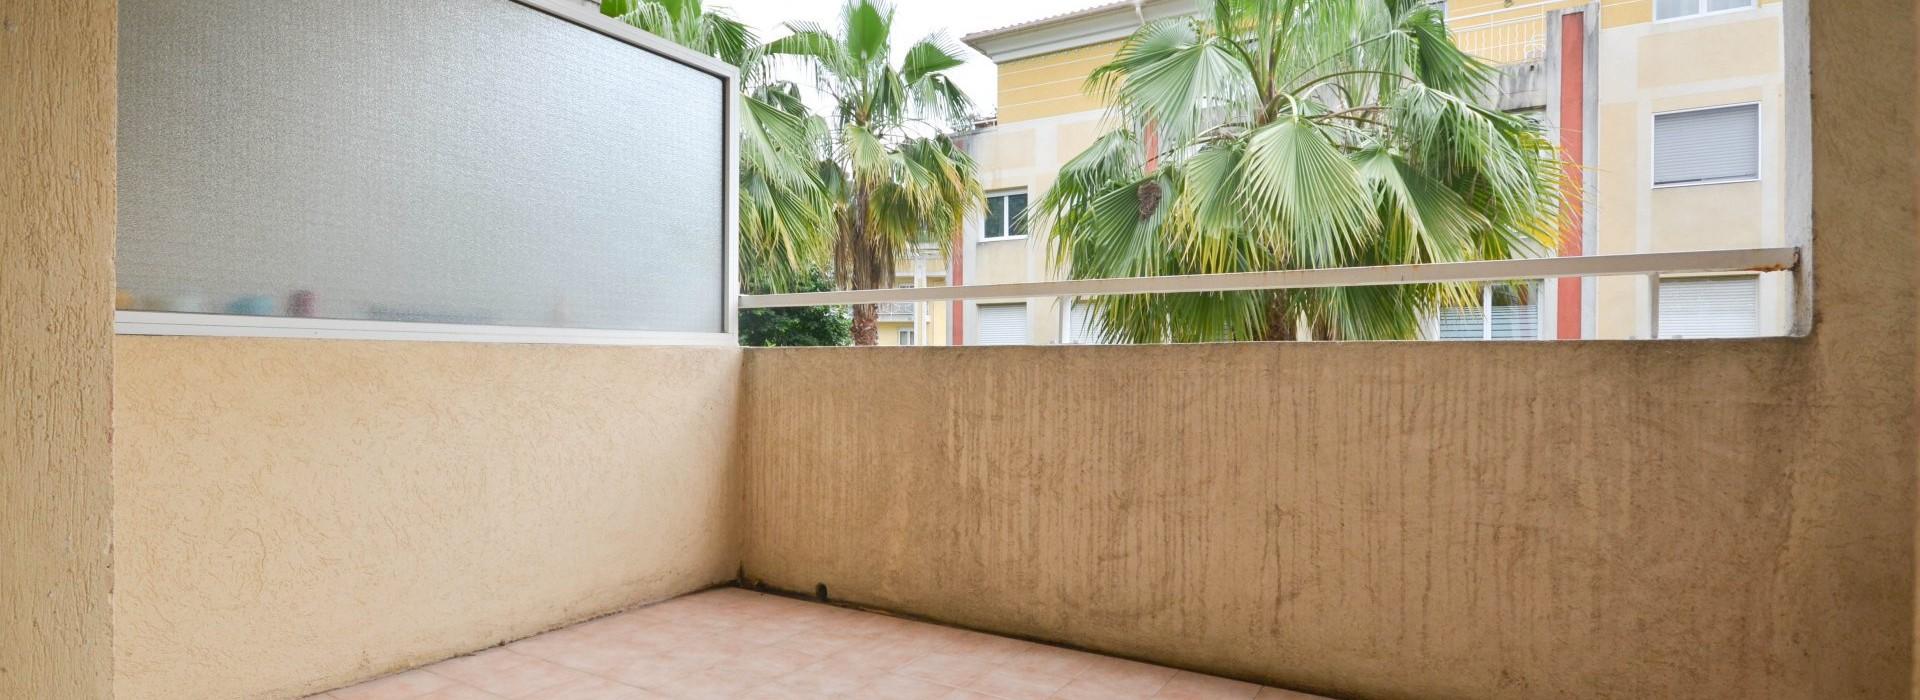 Appartement Nice 1 Pièce 24m2 90,000€